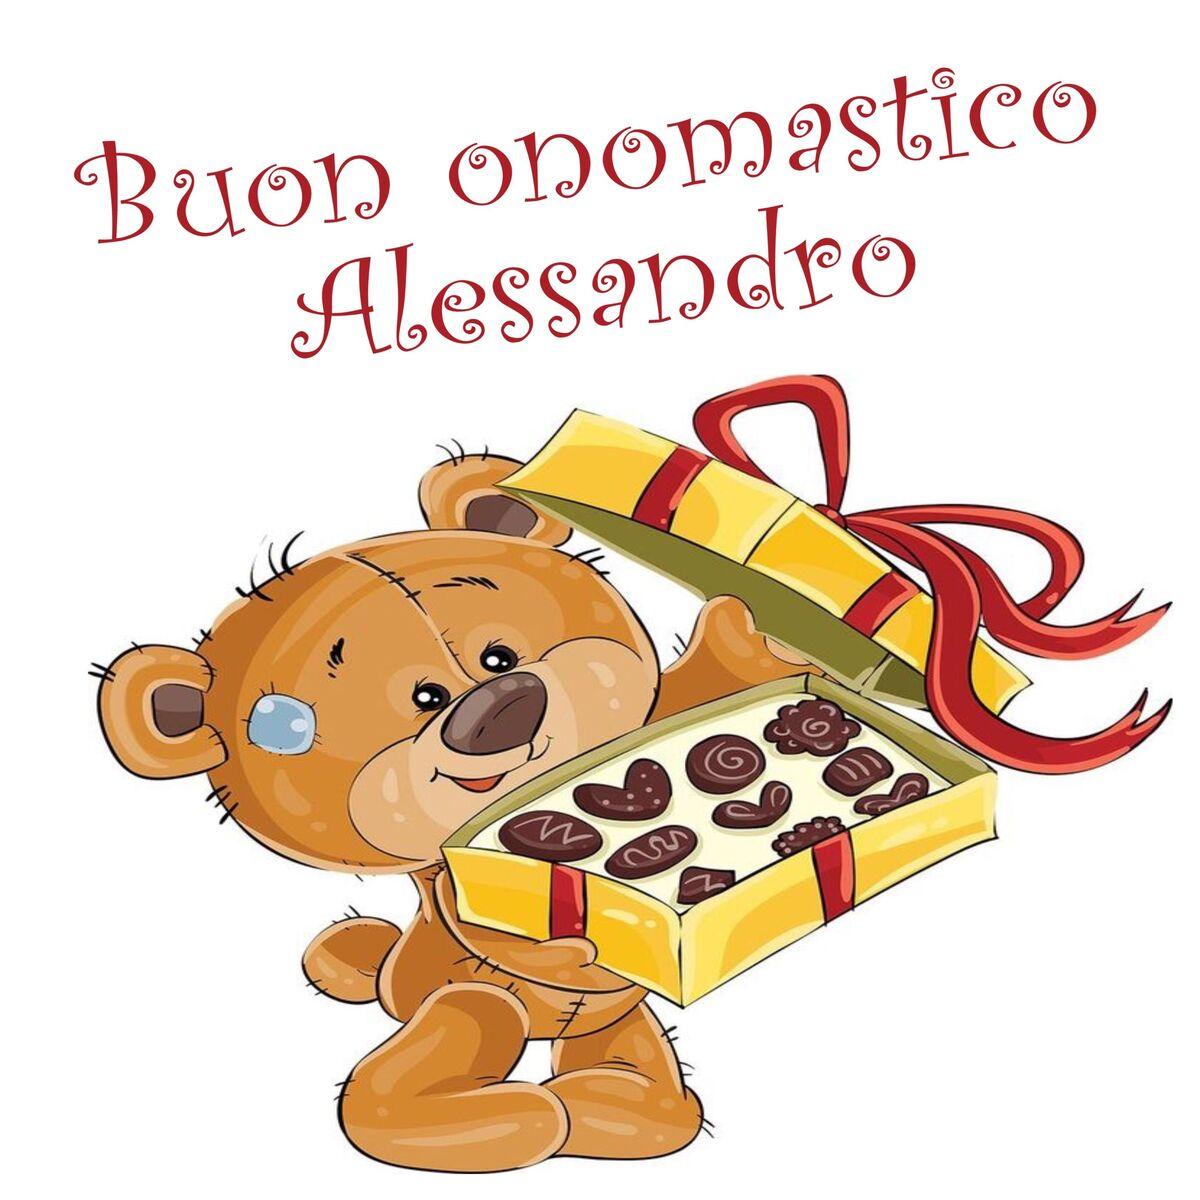 Buon Onomastico Alessandro